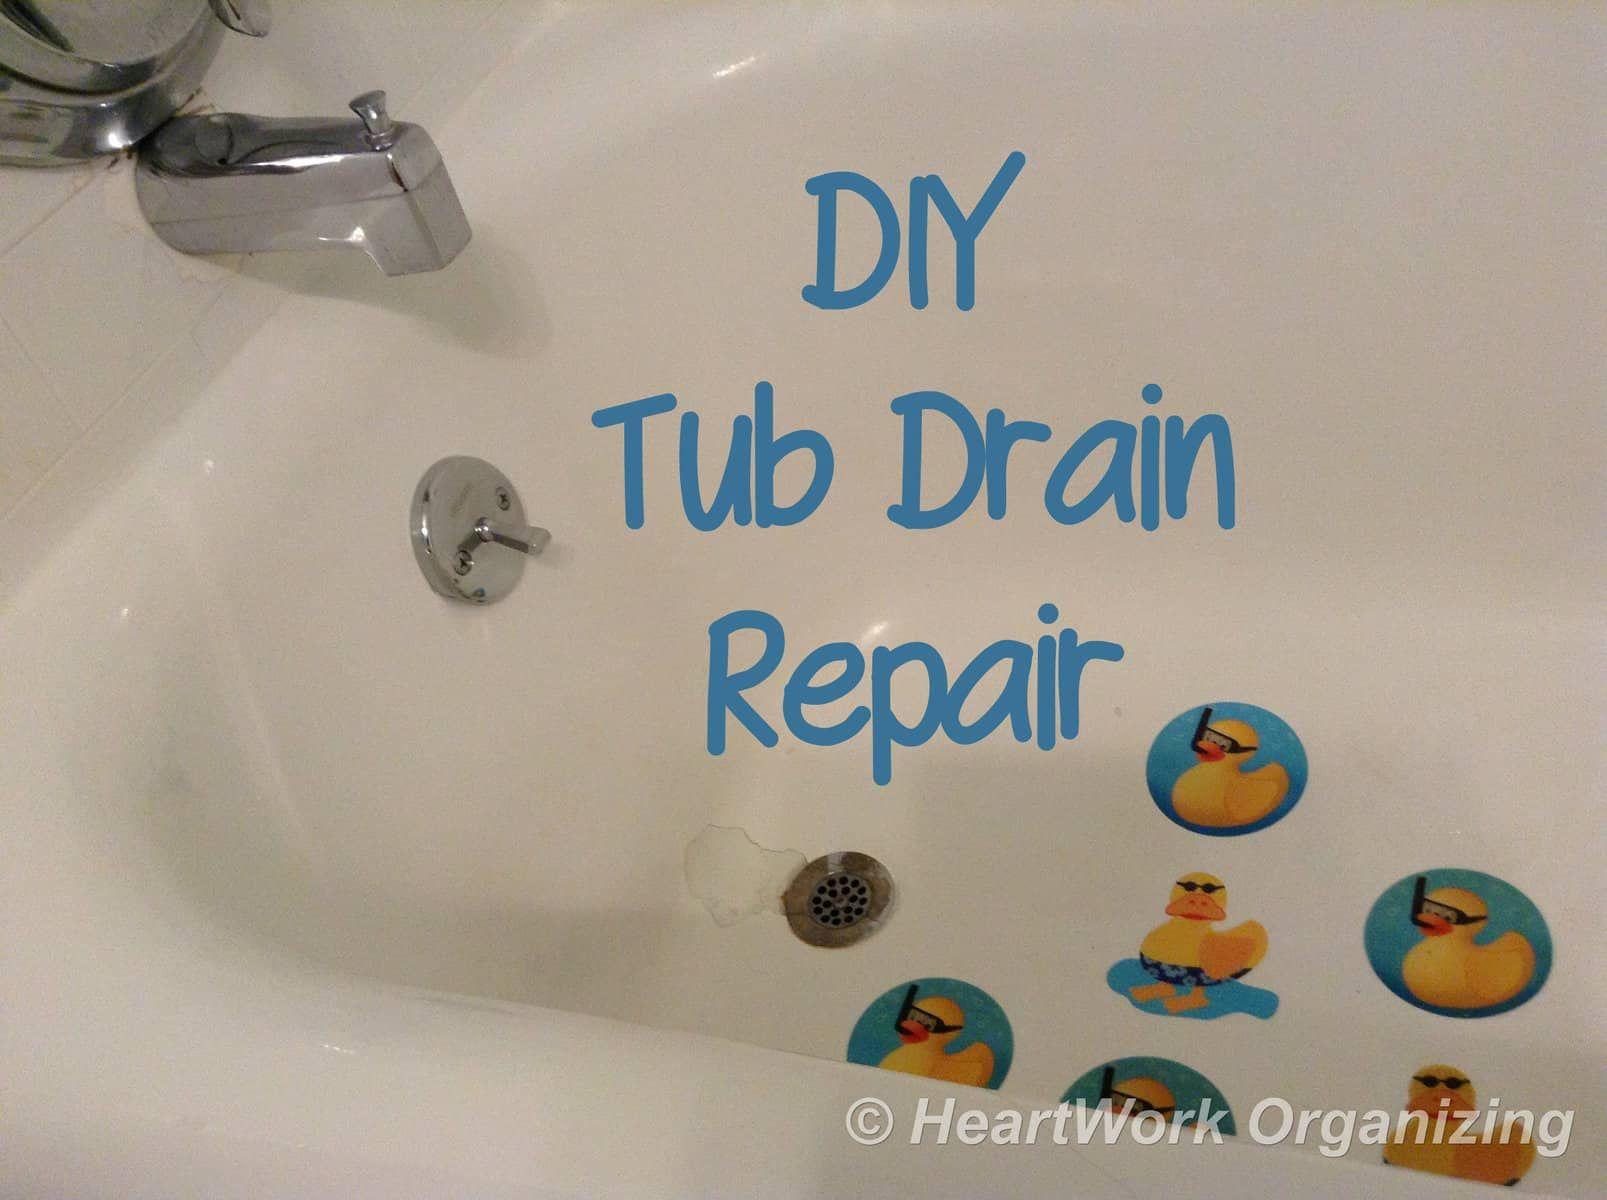 Diy Bathtub Drain Repair Diy Bathtub Drain Repair Bathtub Drain Stopper